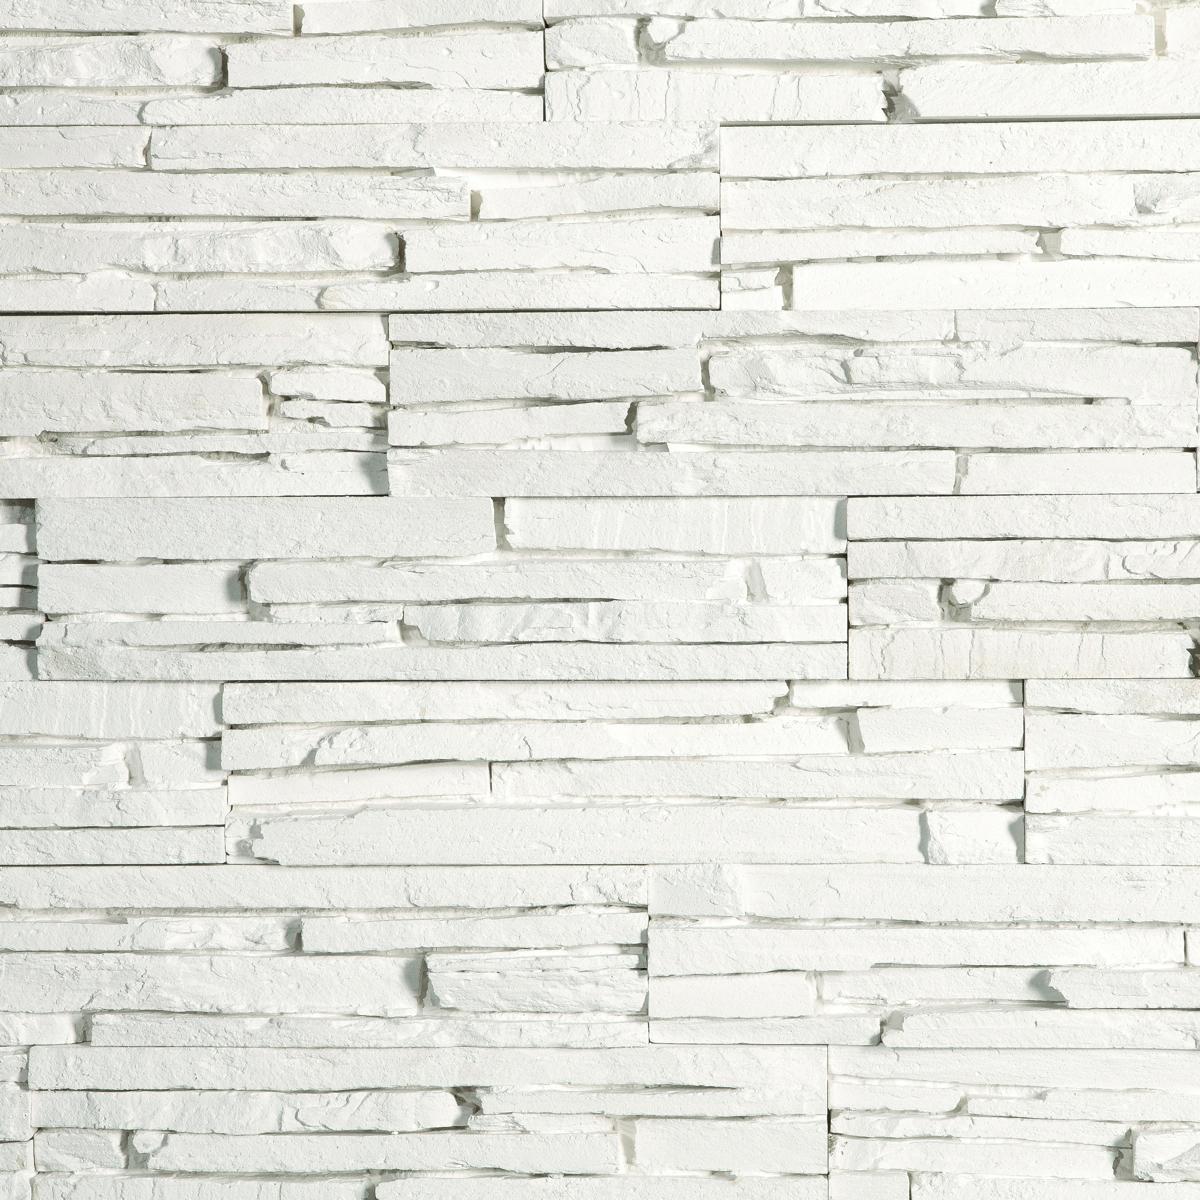 Piatra decorativa Modulo Oslo White interior, alb, 32,5 x 7,5 cm imagine 2021 mathaus